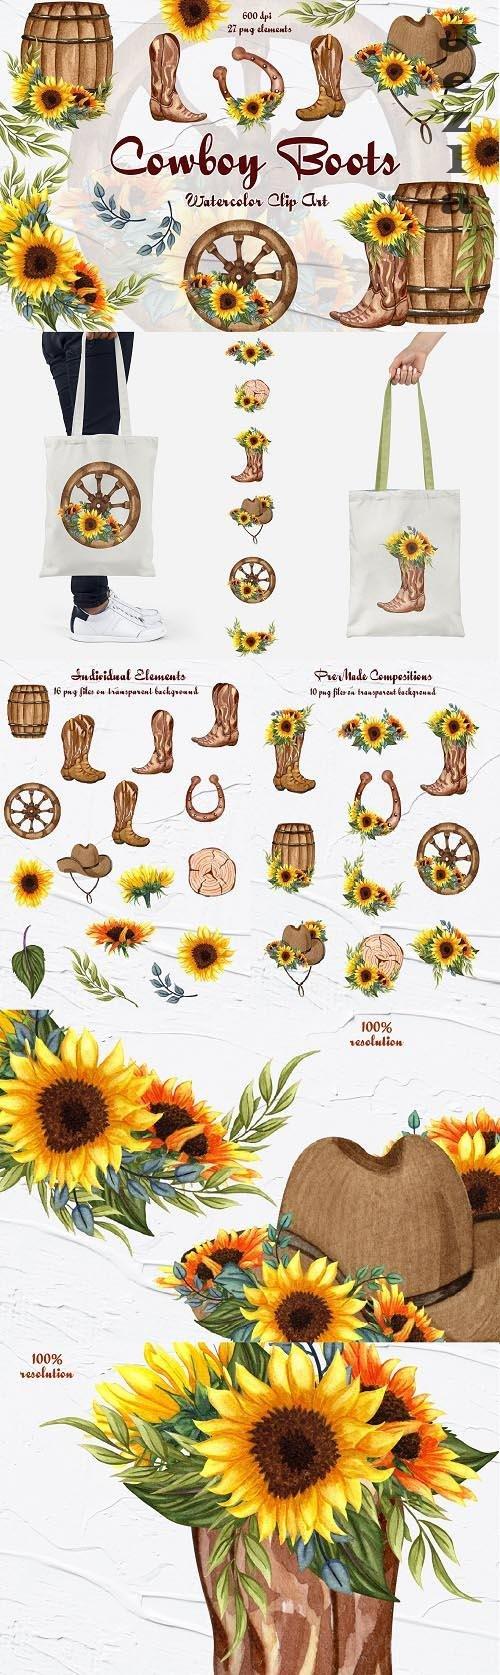 Cowboy Boots Clipart - 1411365